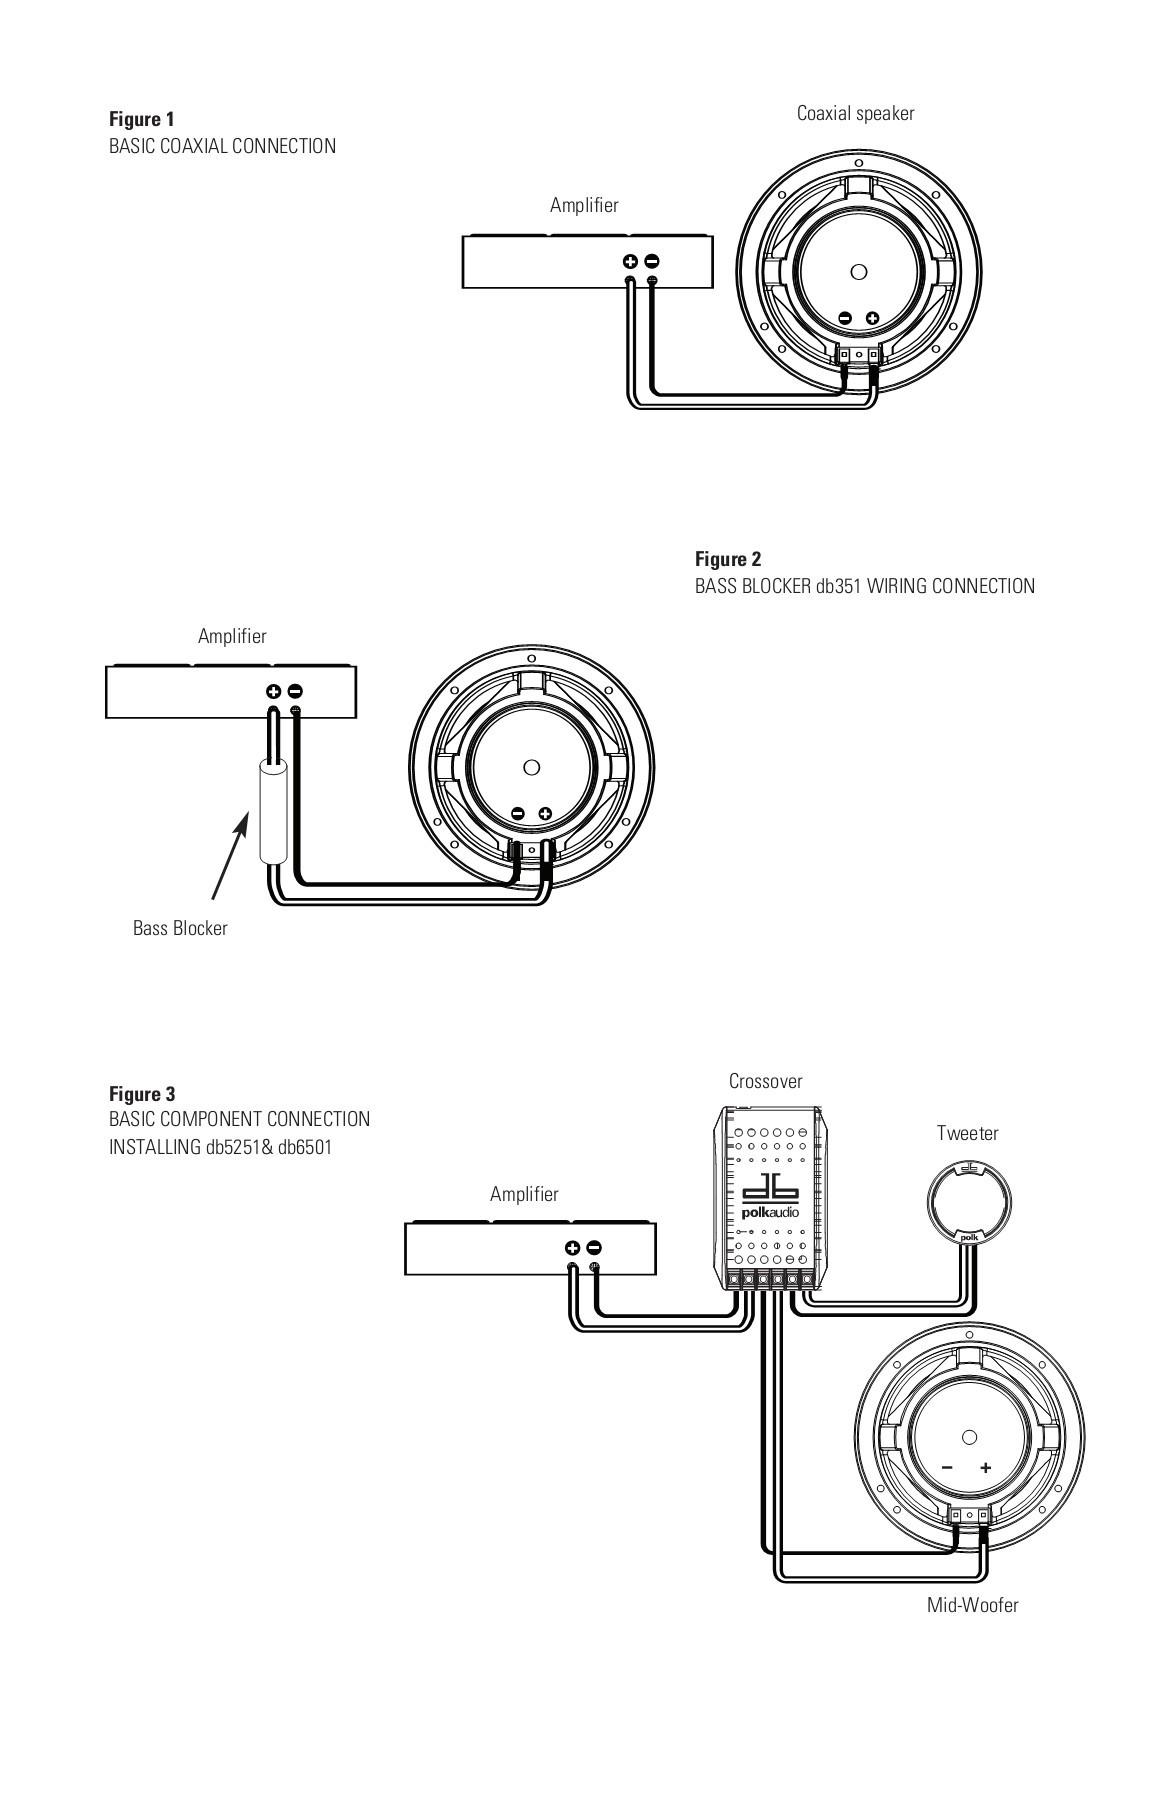 Speaker Bass Blocker Wiring Diagram